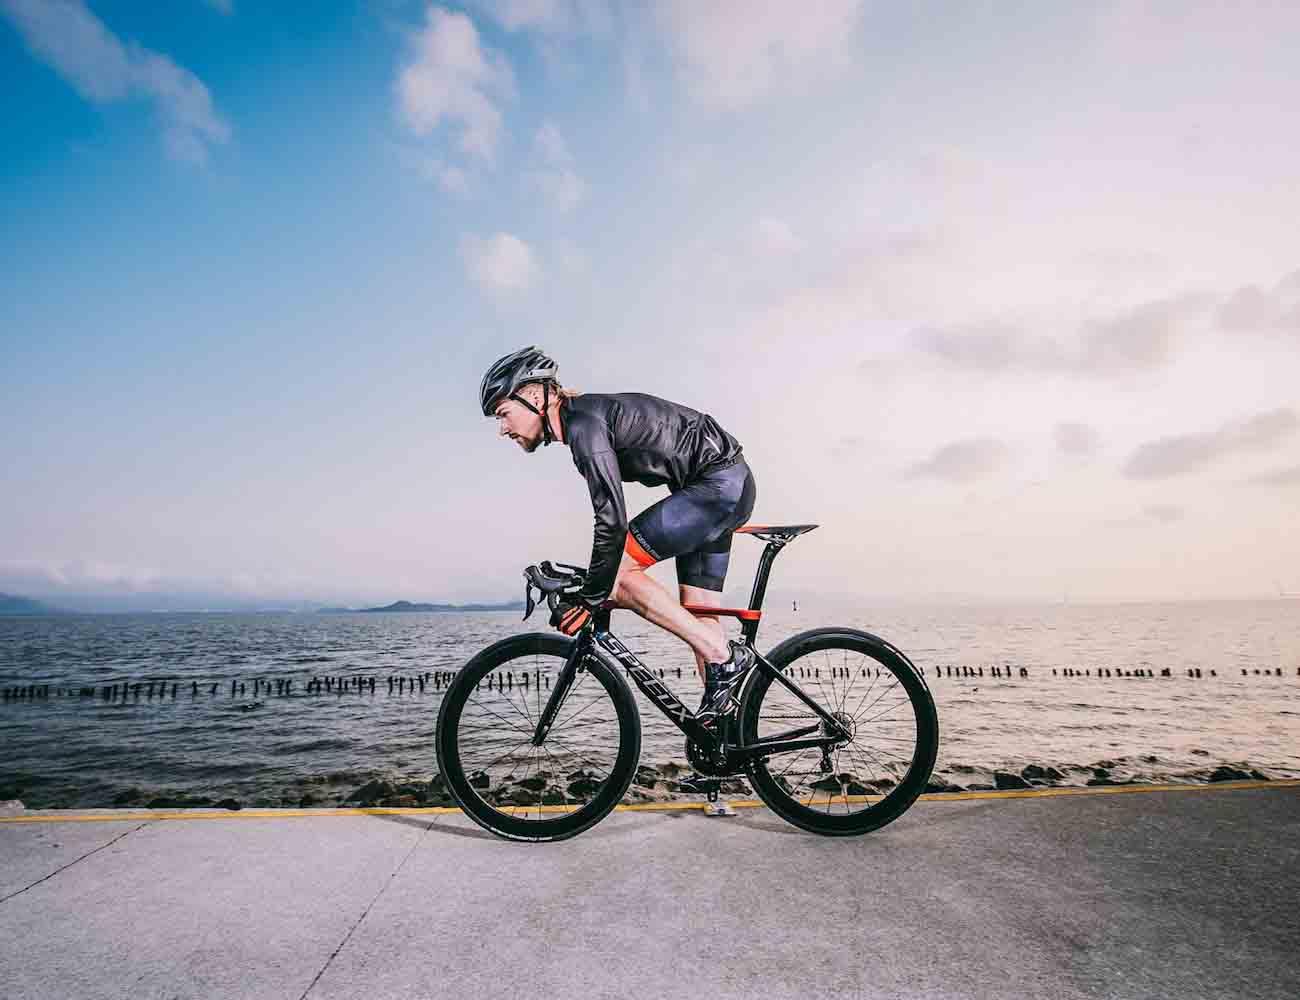 SpeedX Leopard – The First Ever Smart Aero Road Bike